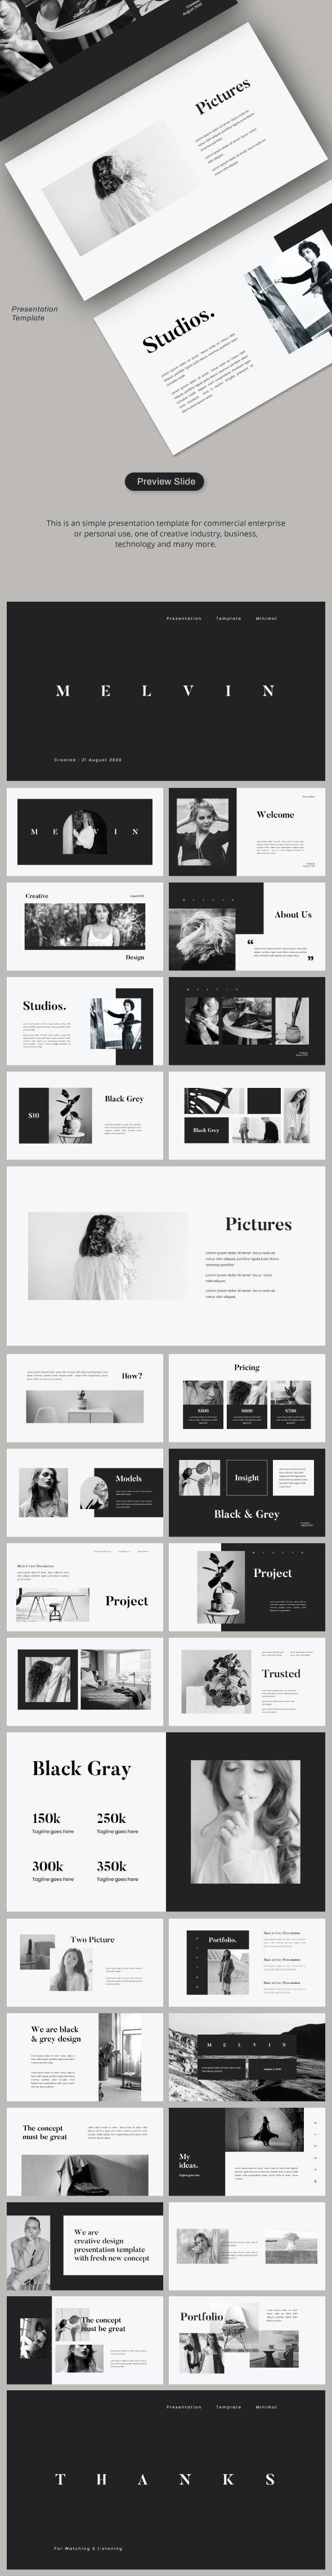 Black Grey - PowerPoint - PowerPoint Templates Presentation Templates